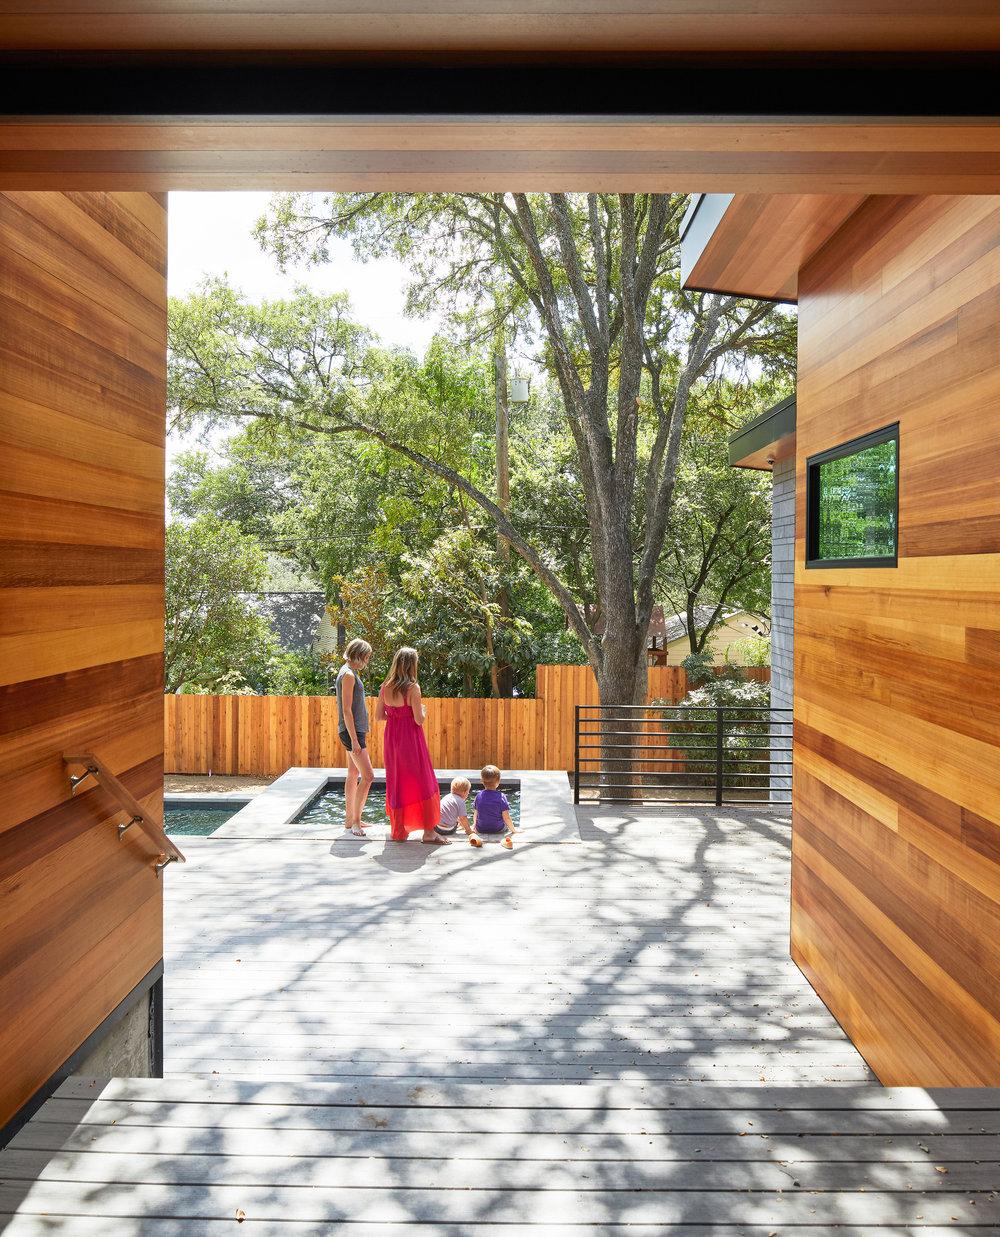 23-Ridgewood Residence by Matt Fajkus Architecture. Photo by Leonid Furmansky.jpg